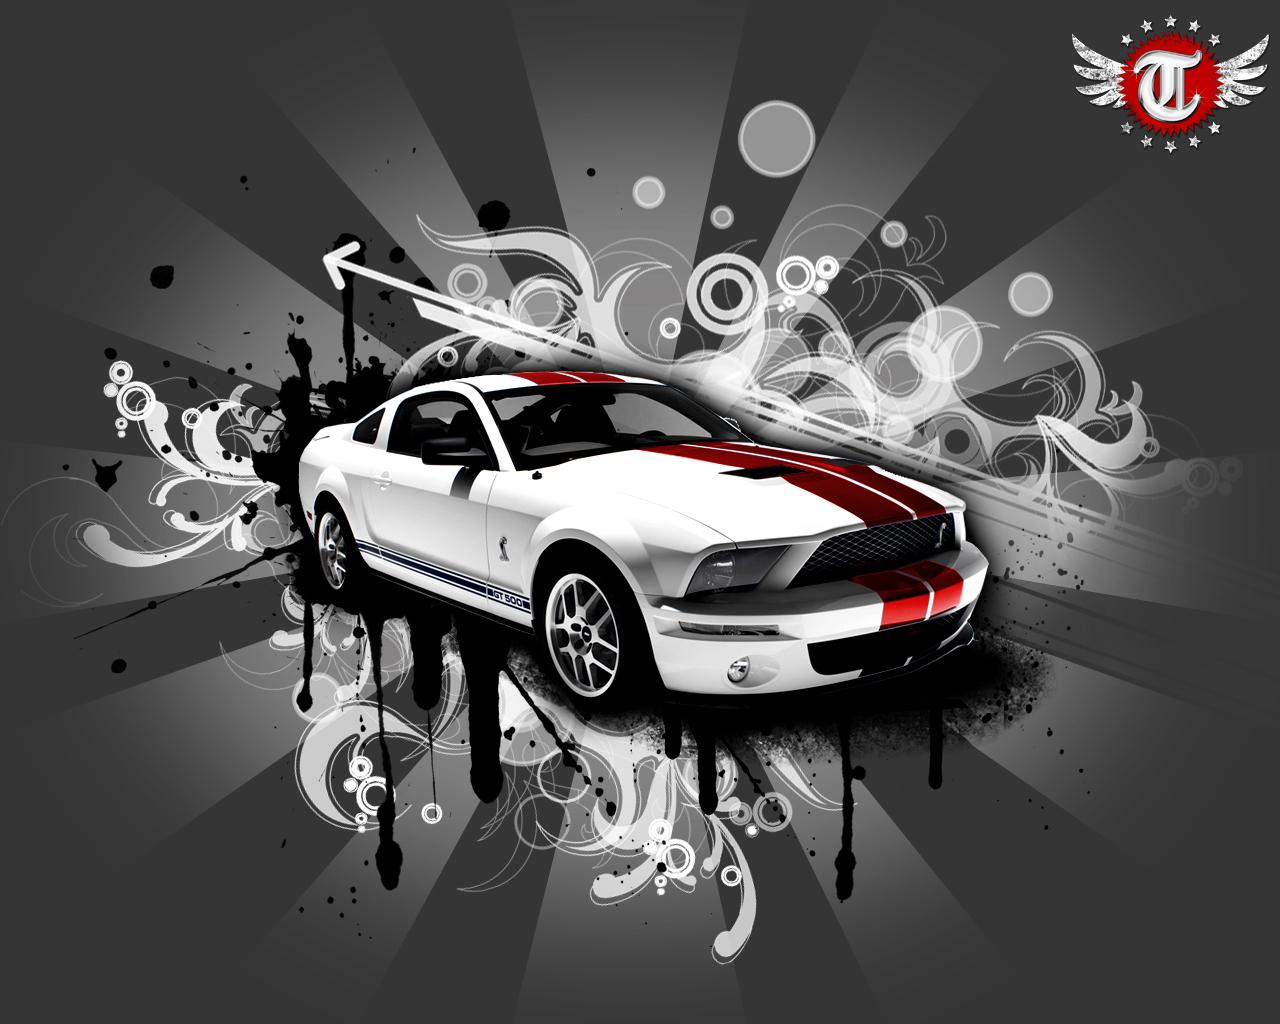 Mustang Wallpaper   mustangs Wallpaper 6411658 1280x1024